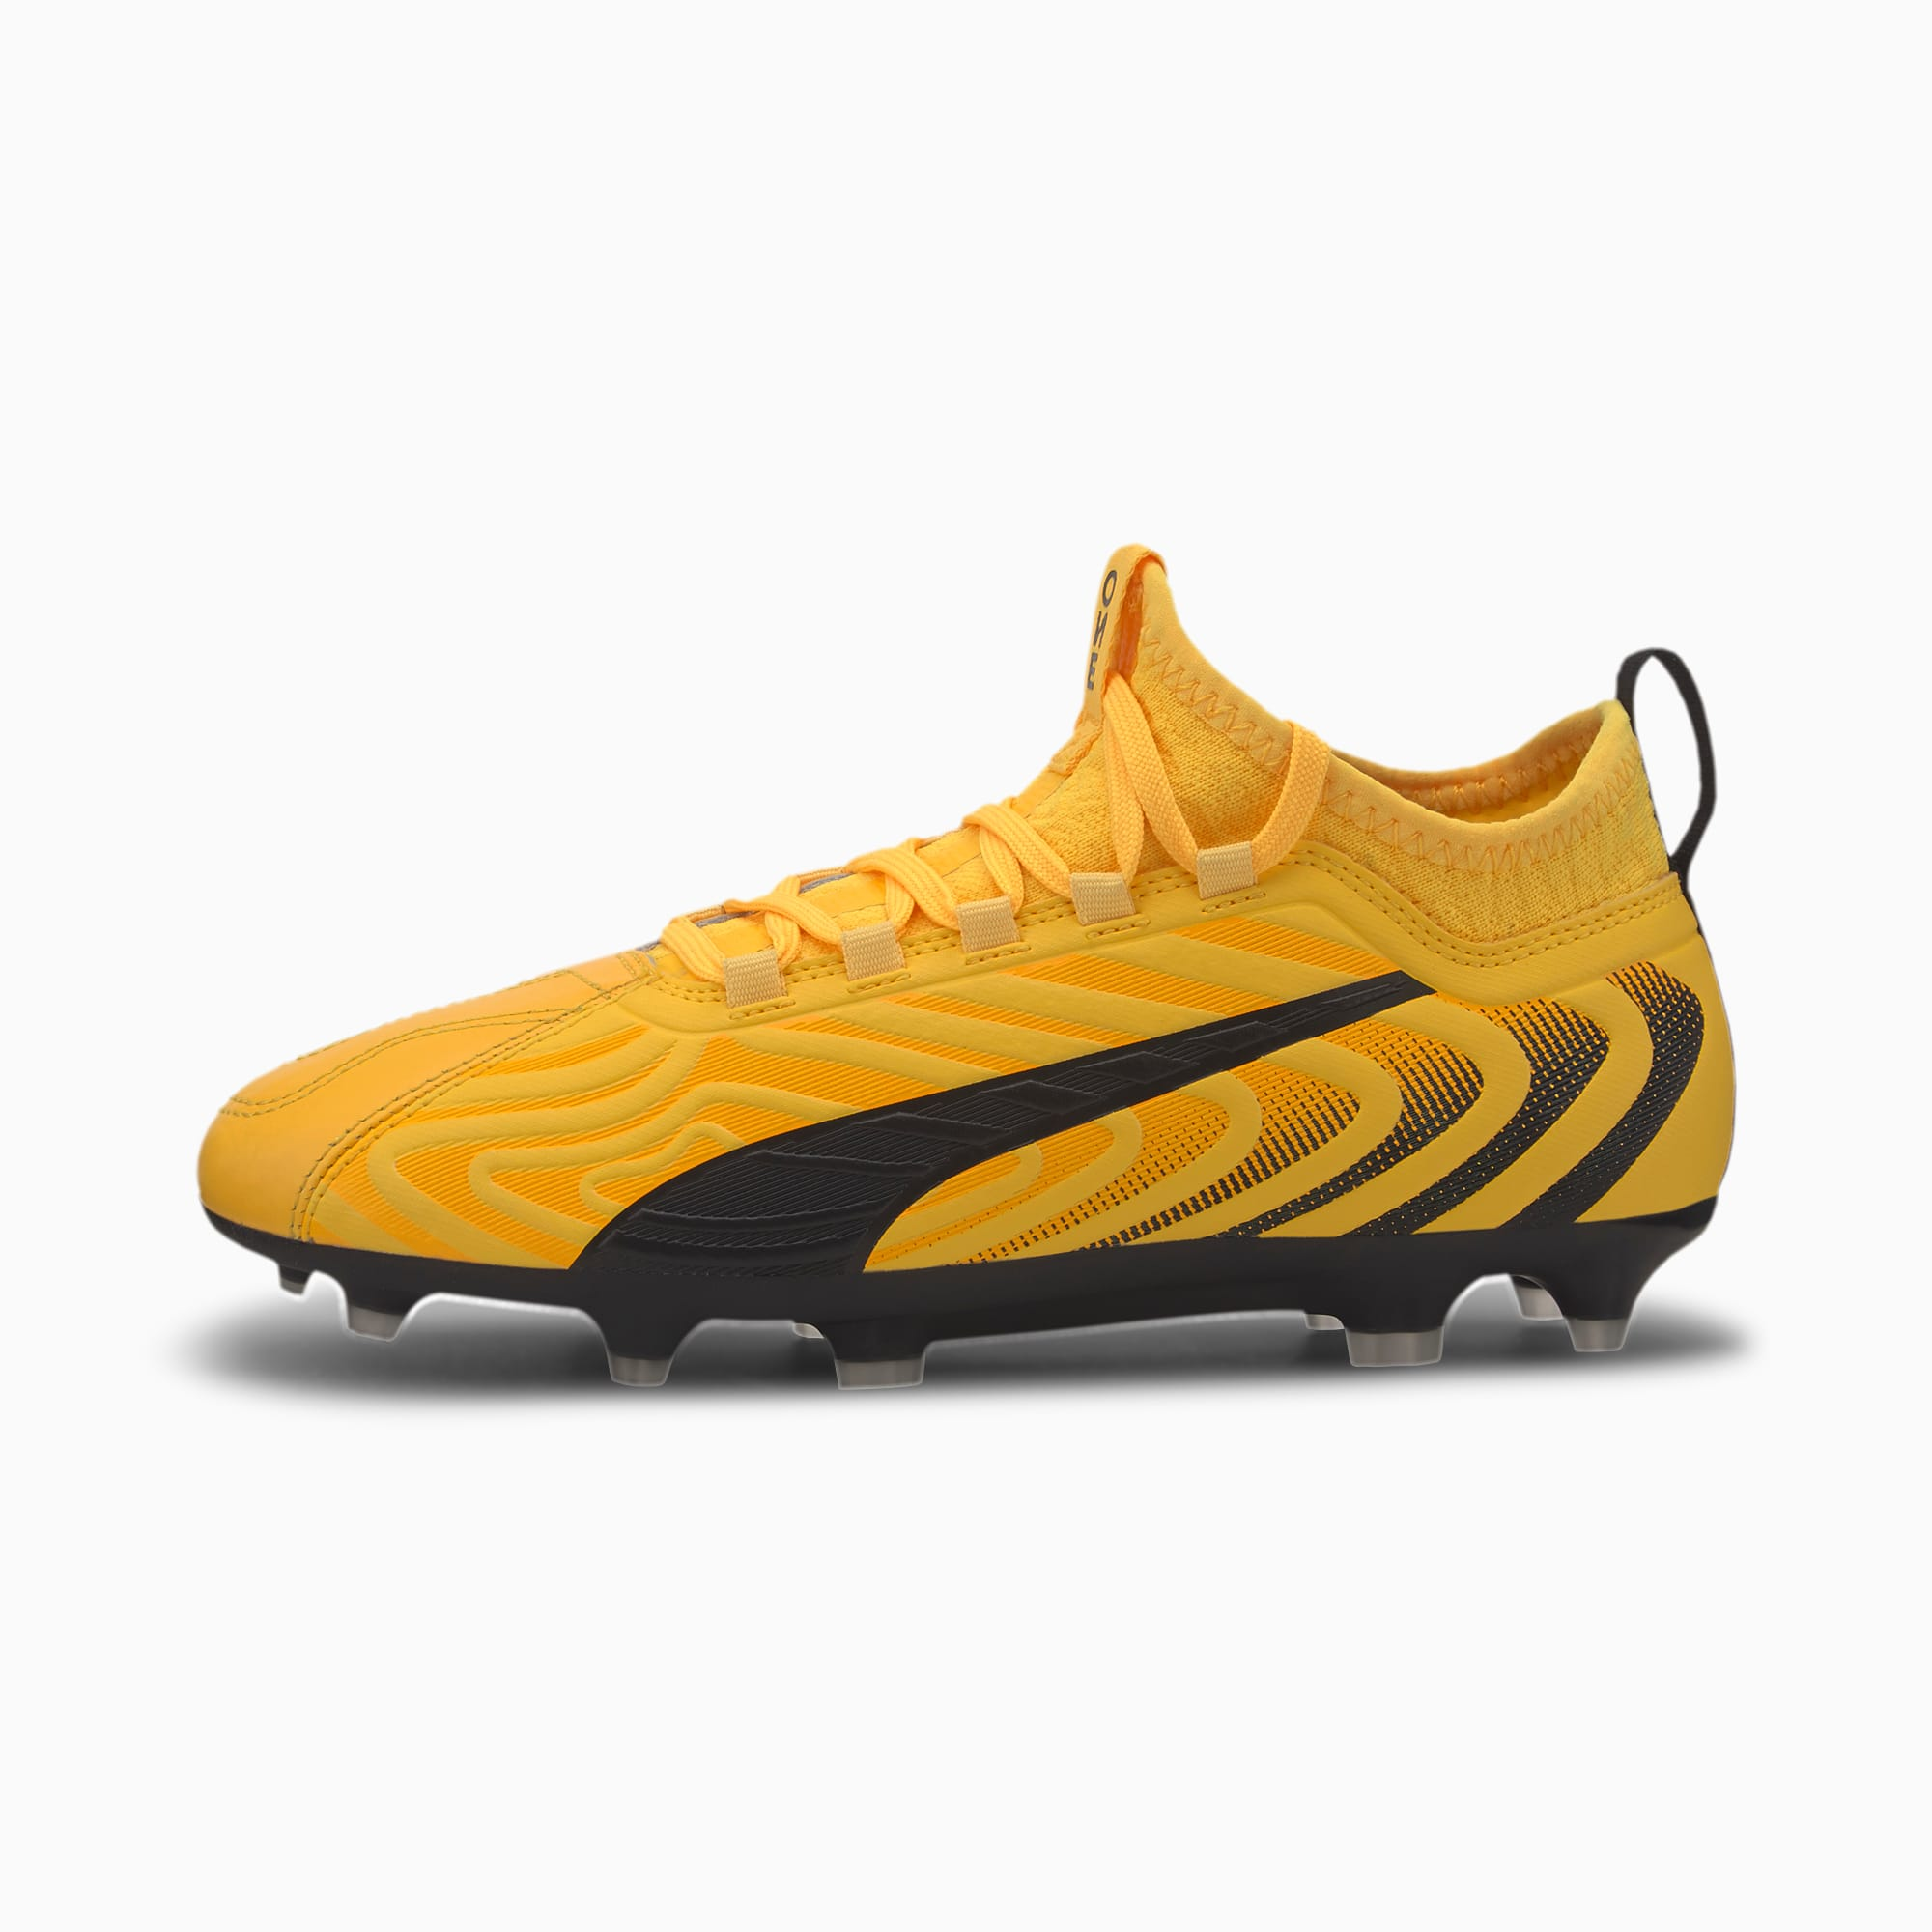 chaussures de foot puma one